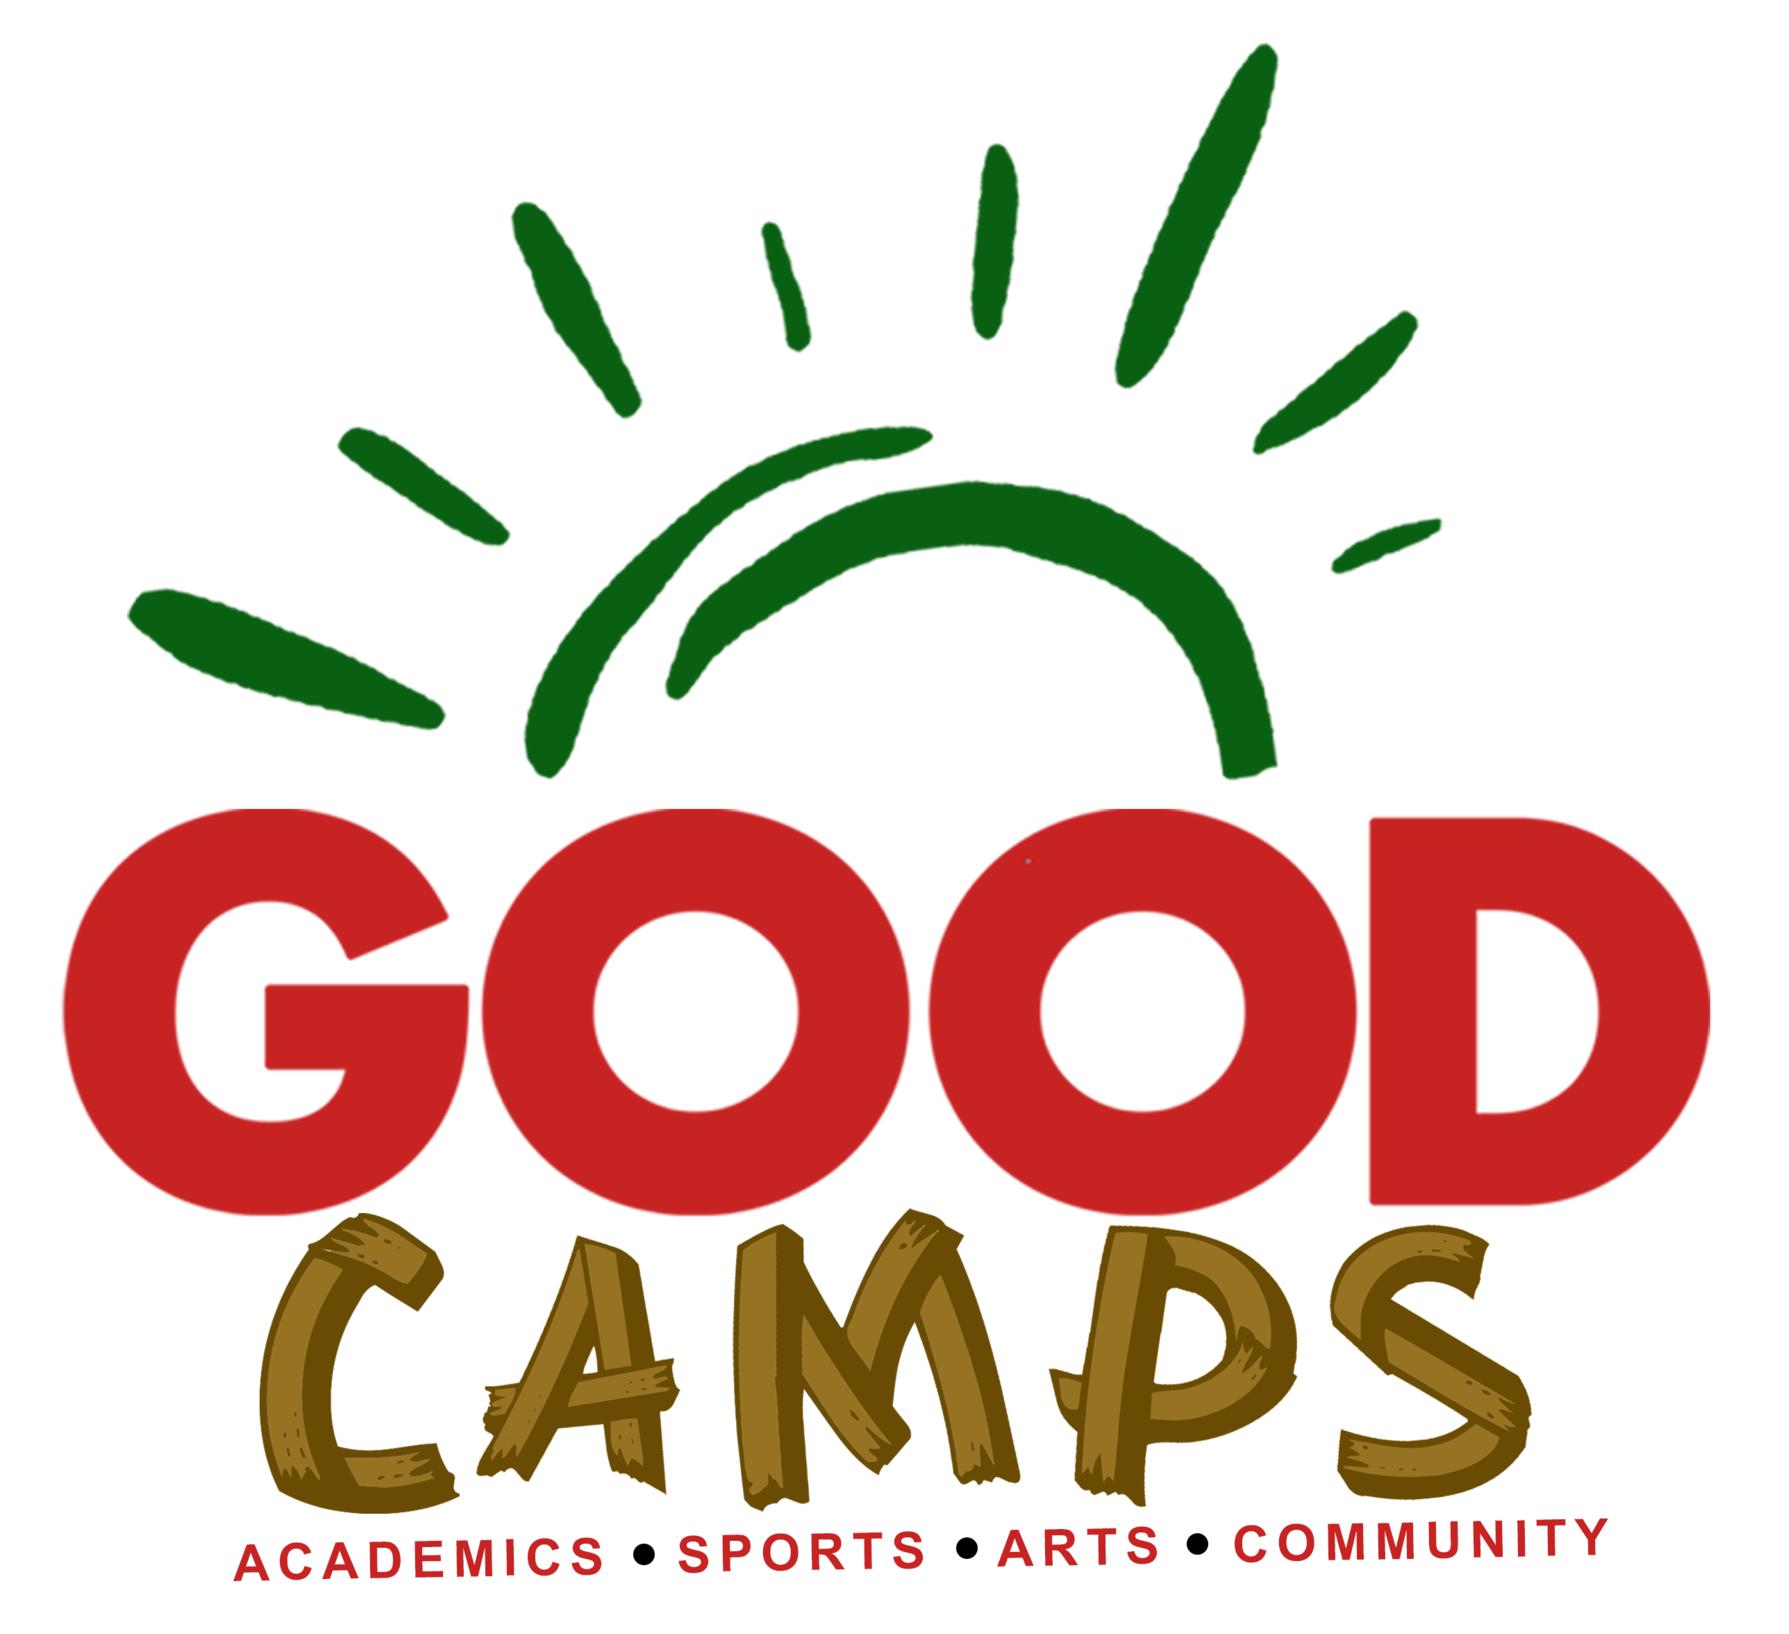 GoodCamps